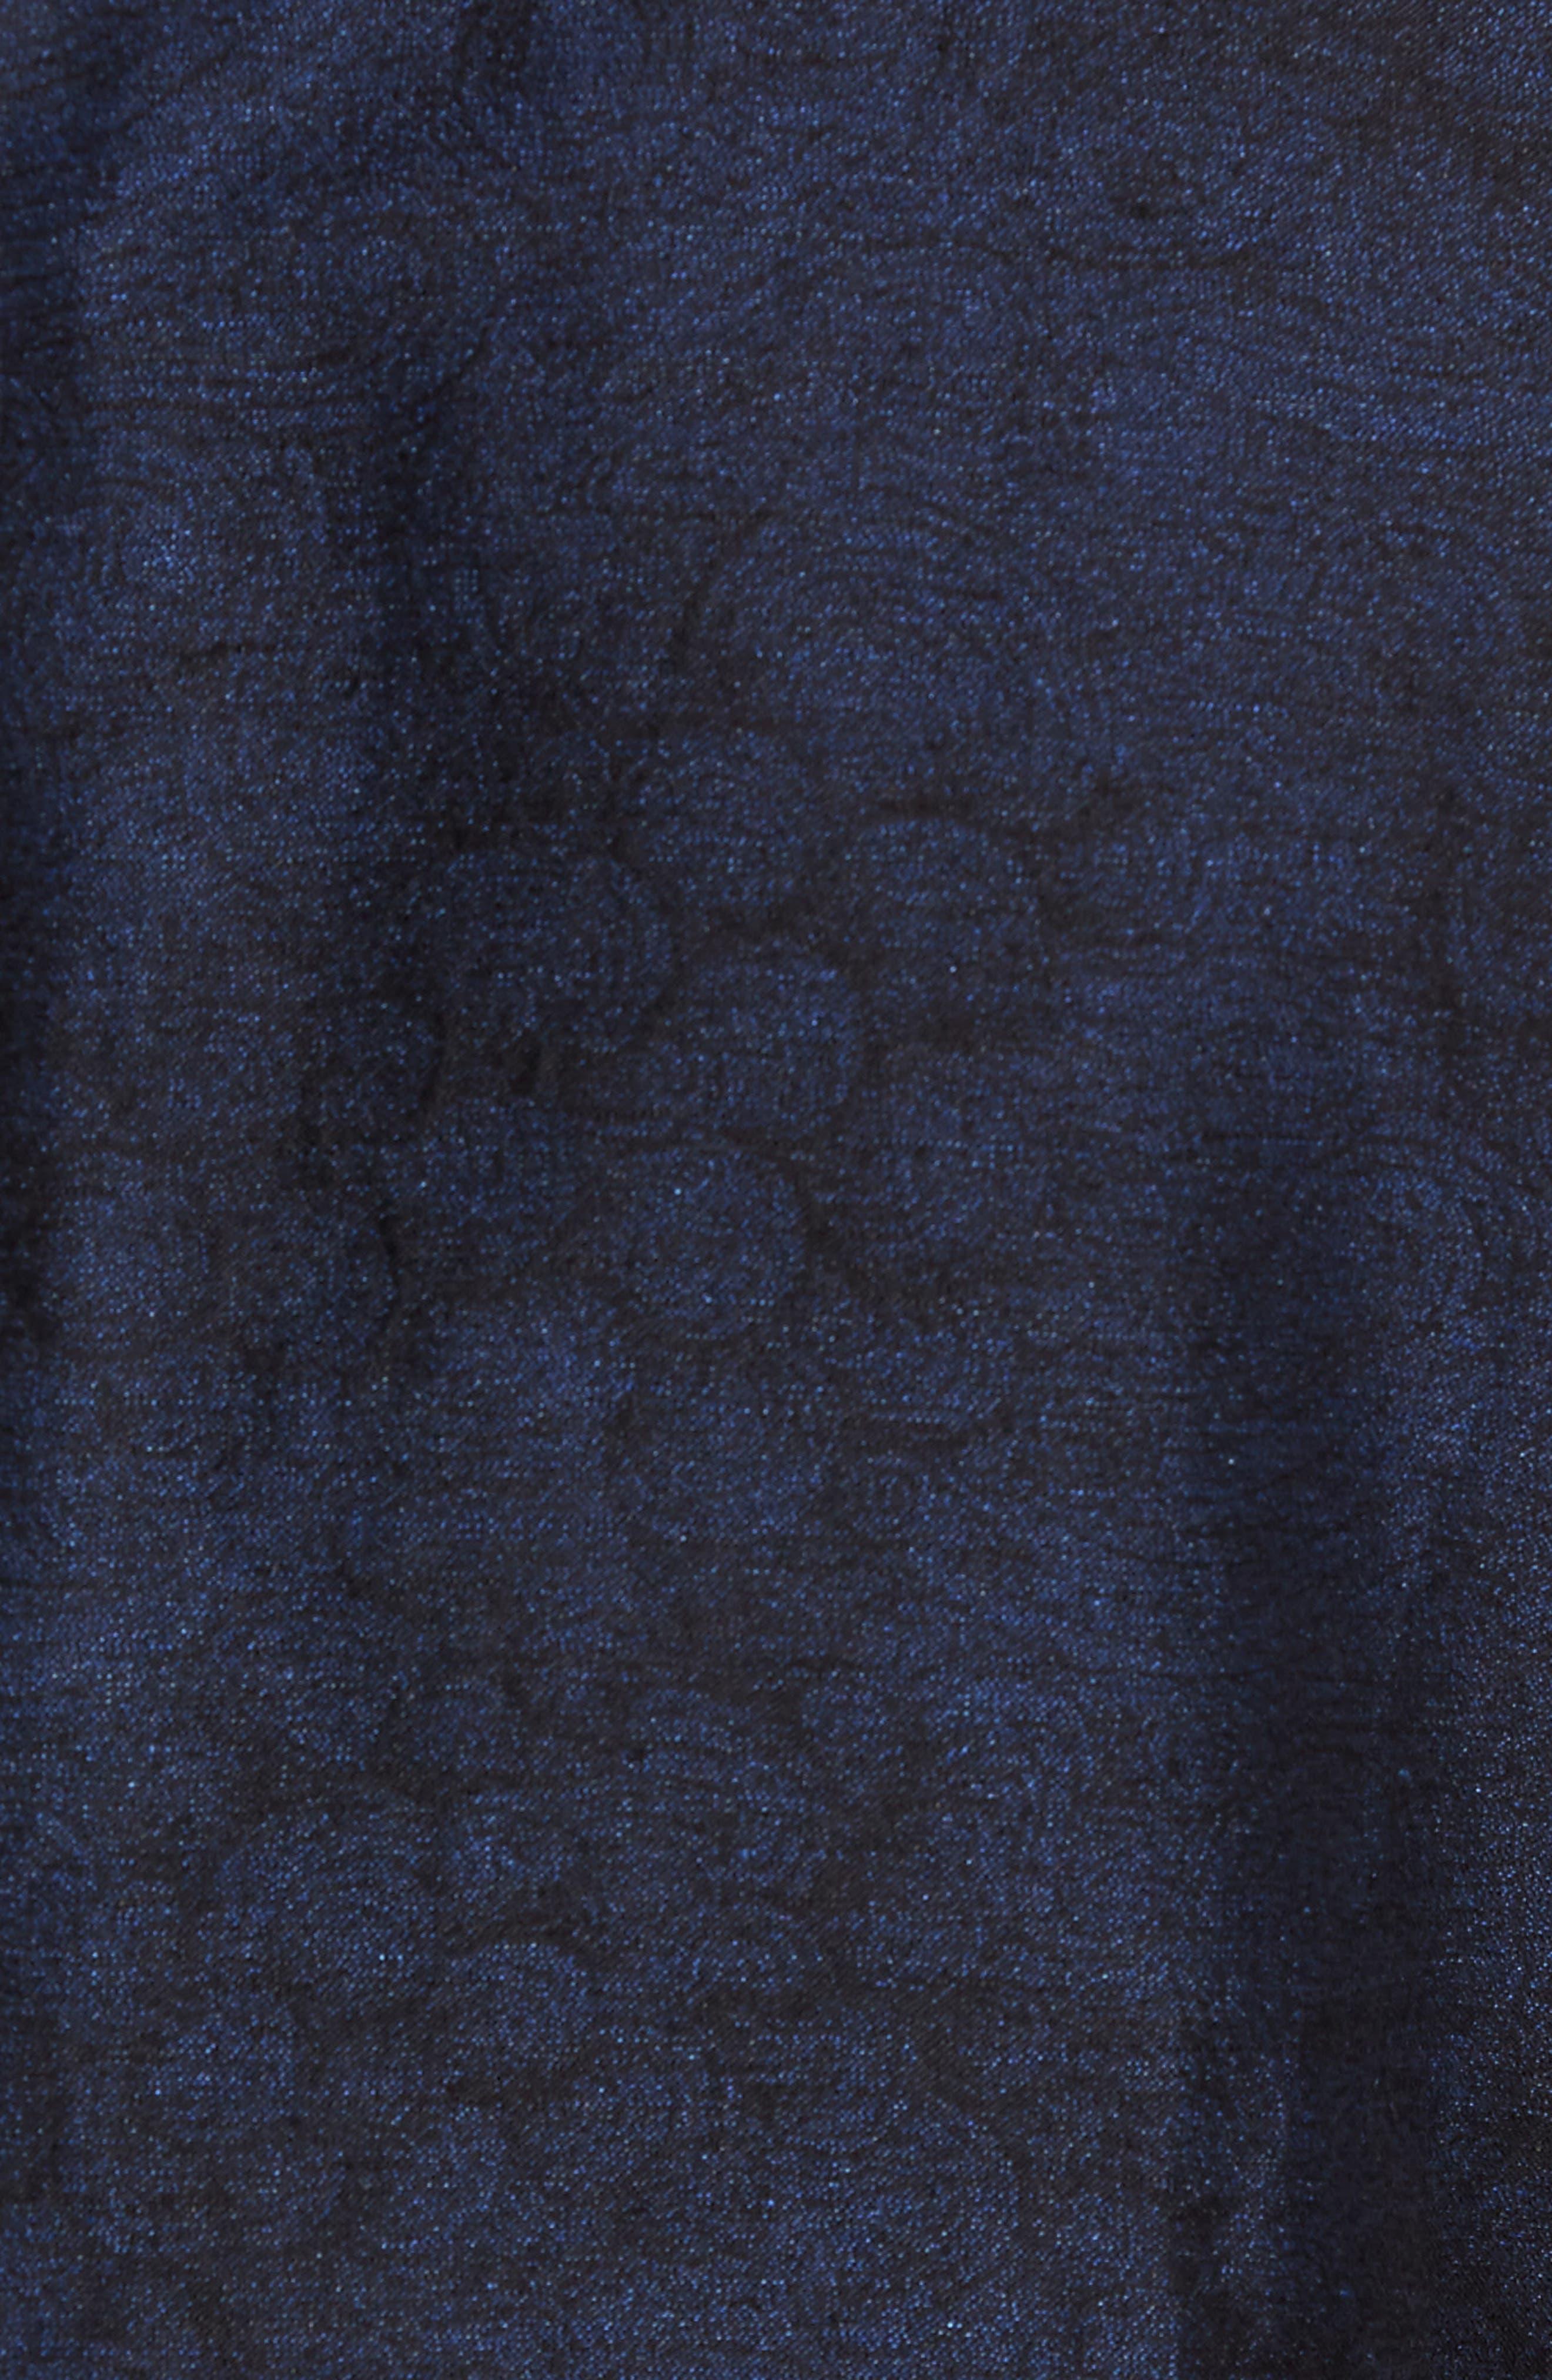 Slim Fit Patterned Linen Blend Sport Coat,                             Alternate thumbnail 6, color,                             401